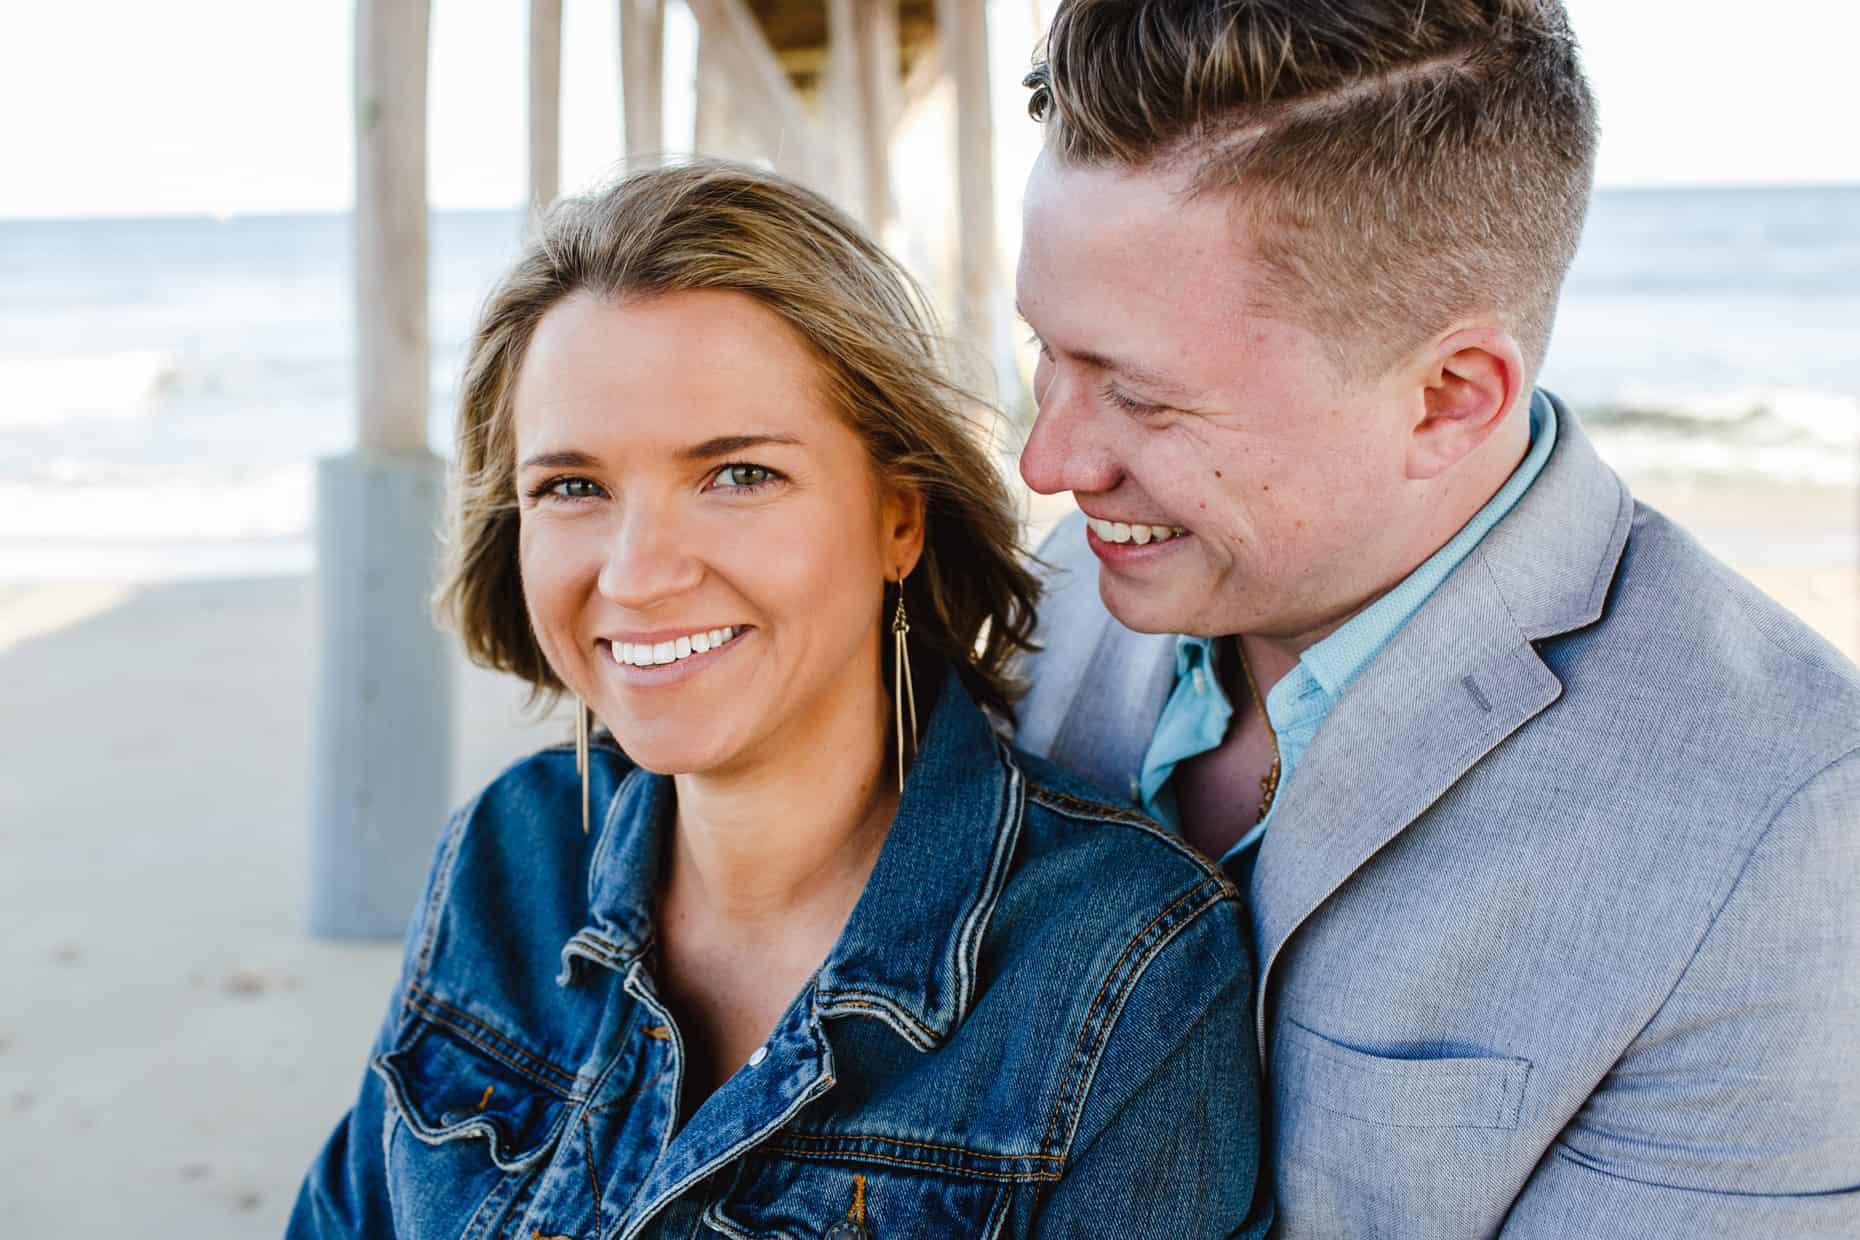 Belmar BEach Engagement Pictures